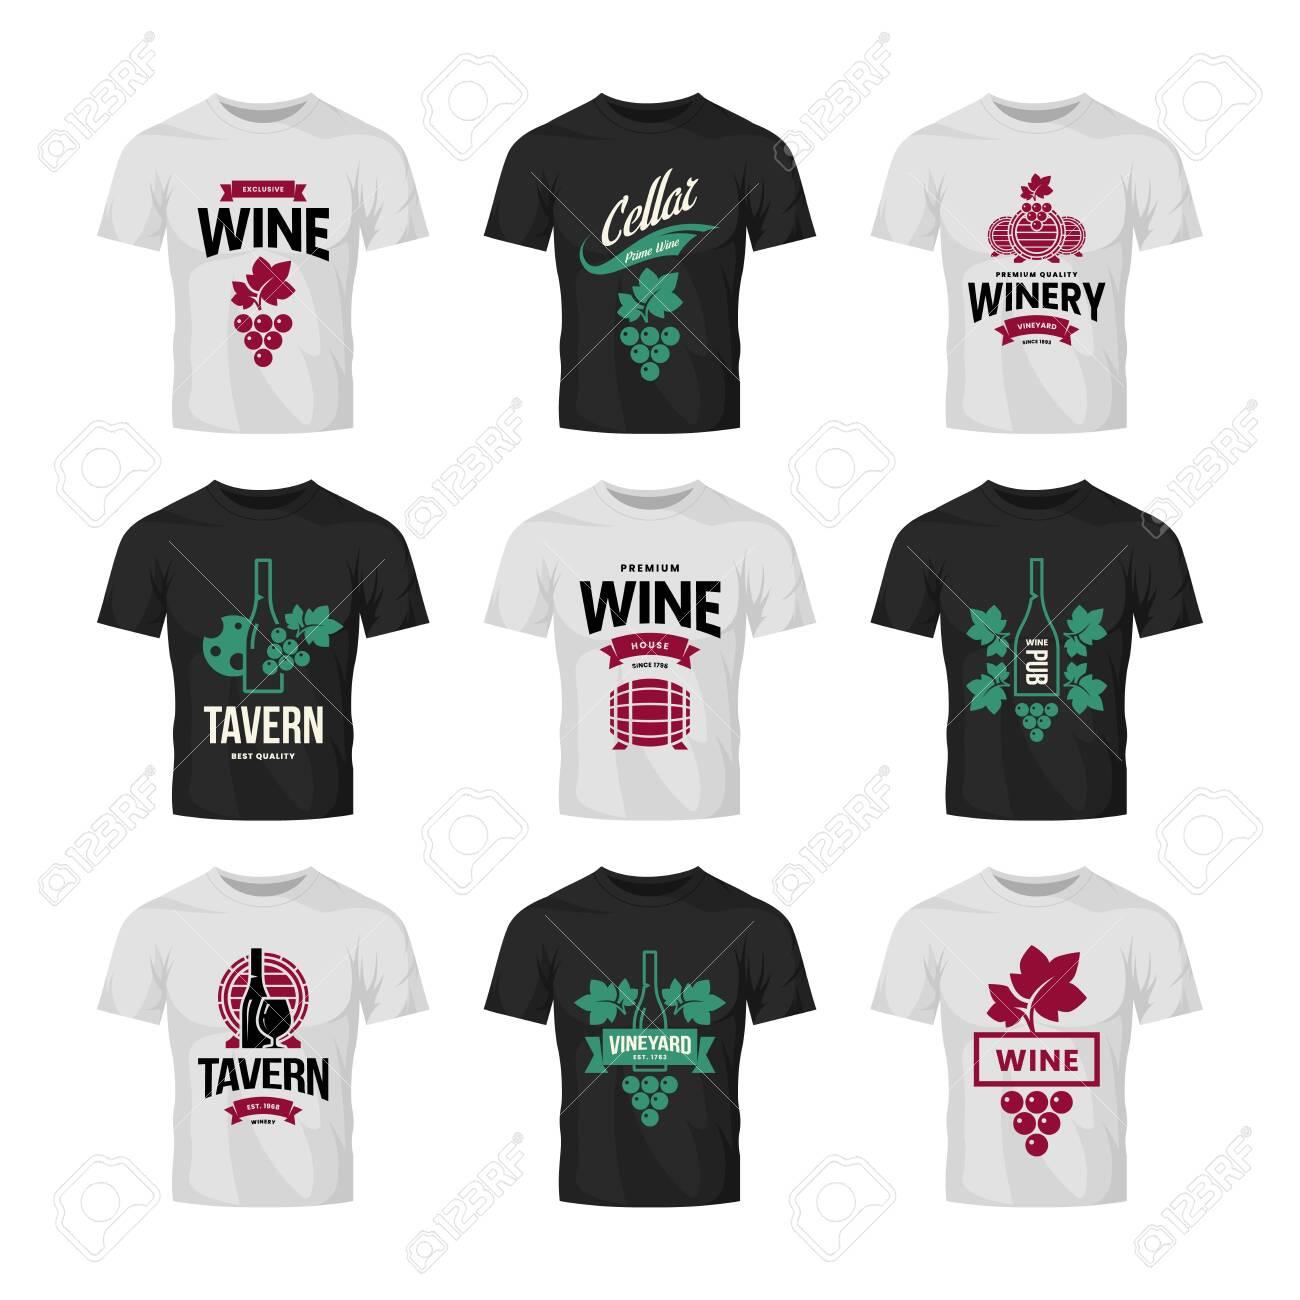 Modern wine vector logo collection for tavern, restaurant, shop, store, club and cellar on t-shirt mock up. Premium quality vinery logotype illustration set. Fashion brand badge design template bundle. - 120438823